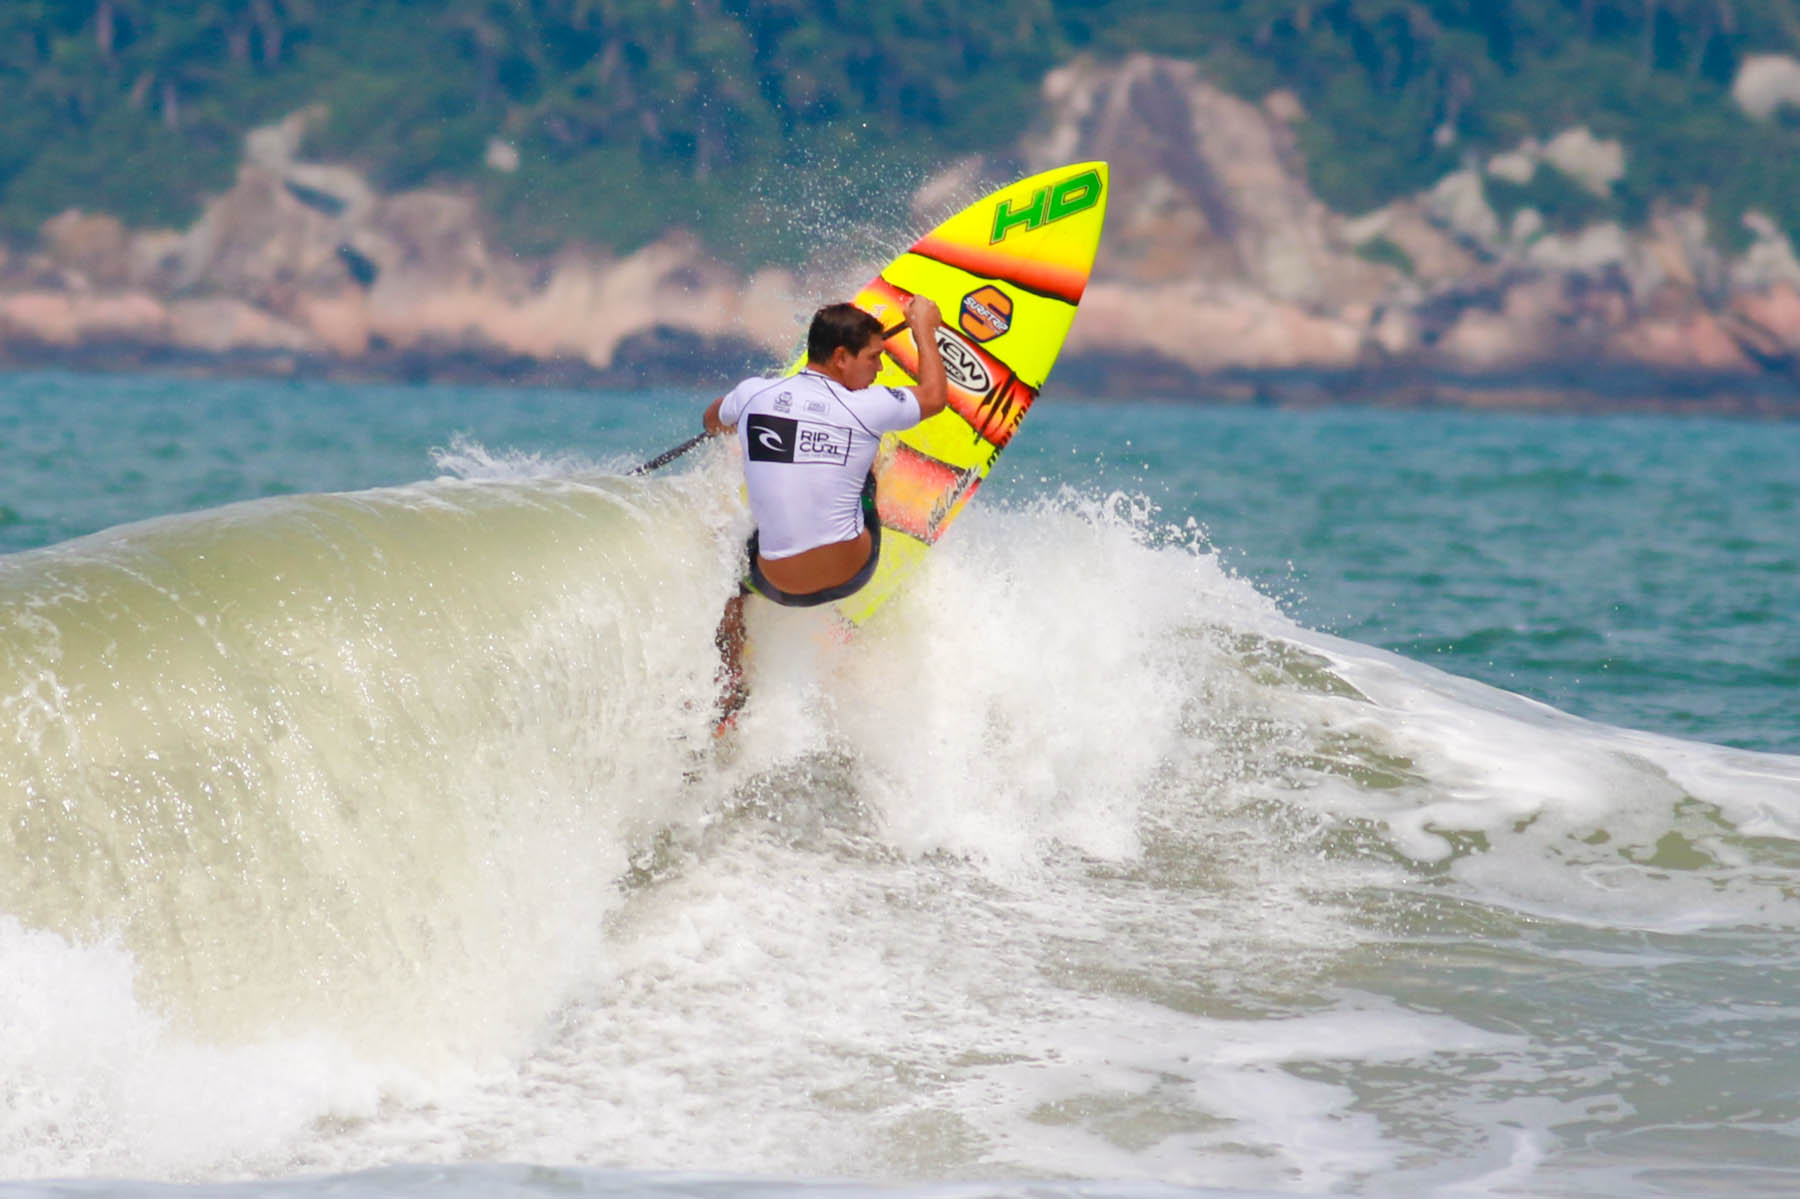 Rip Curl Guarujaense de Surf, Imagens de SUP